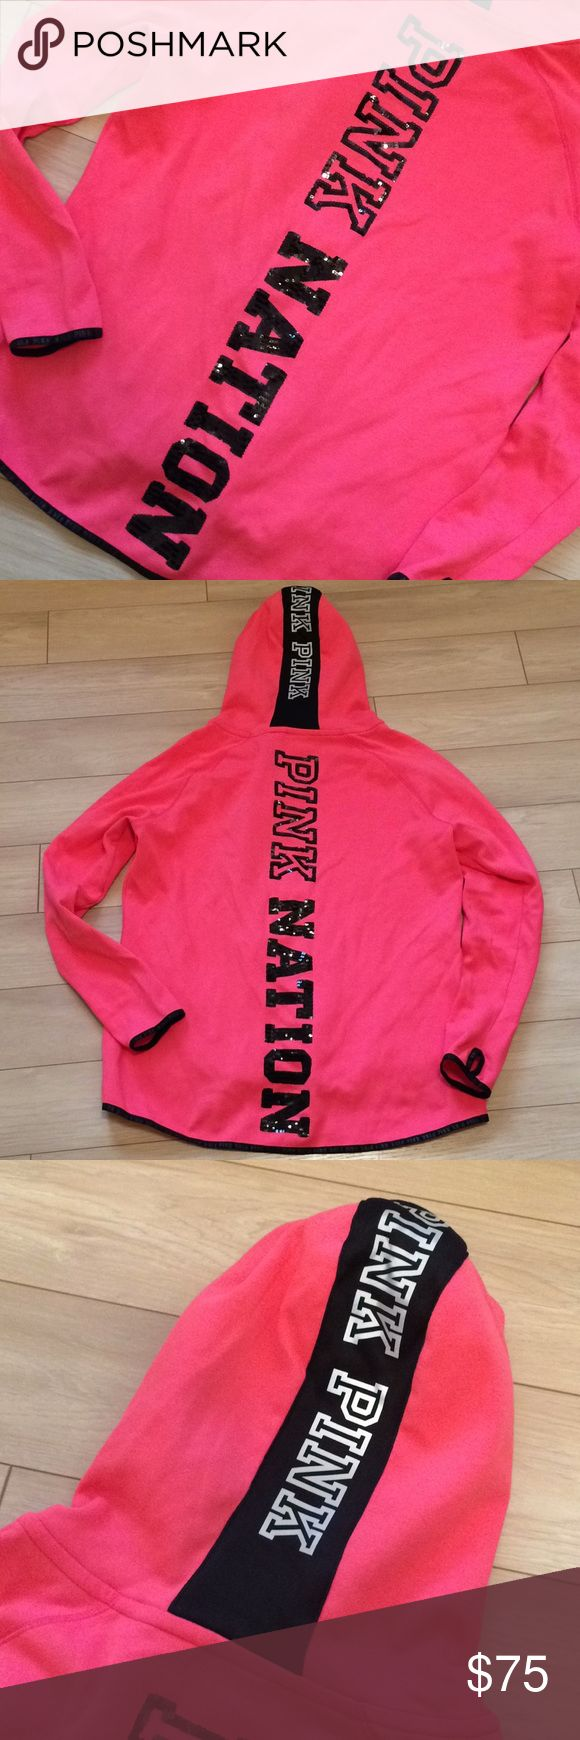 Best 25  Vs pink hoodie ideas on Pinterest | Pink clothing brand ...